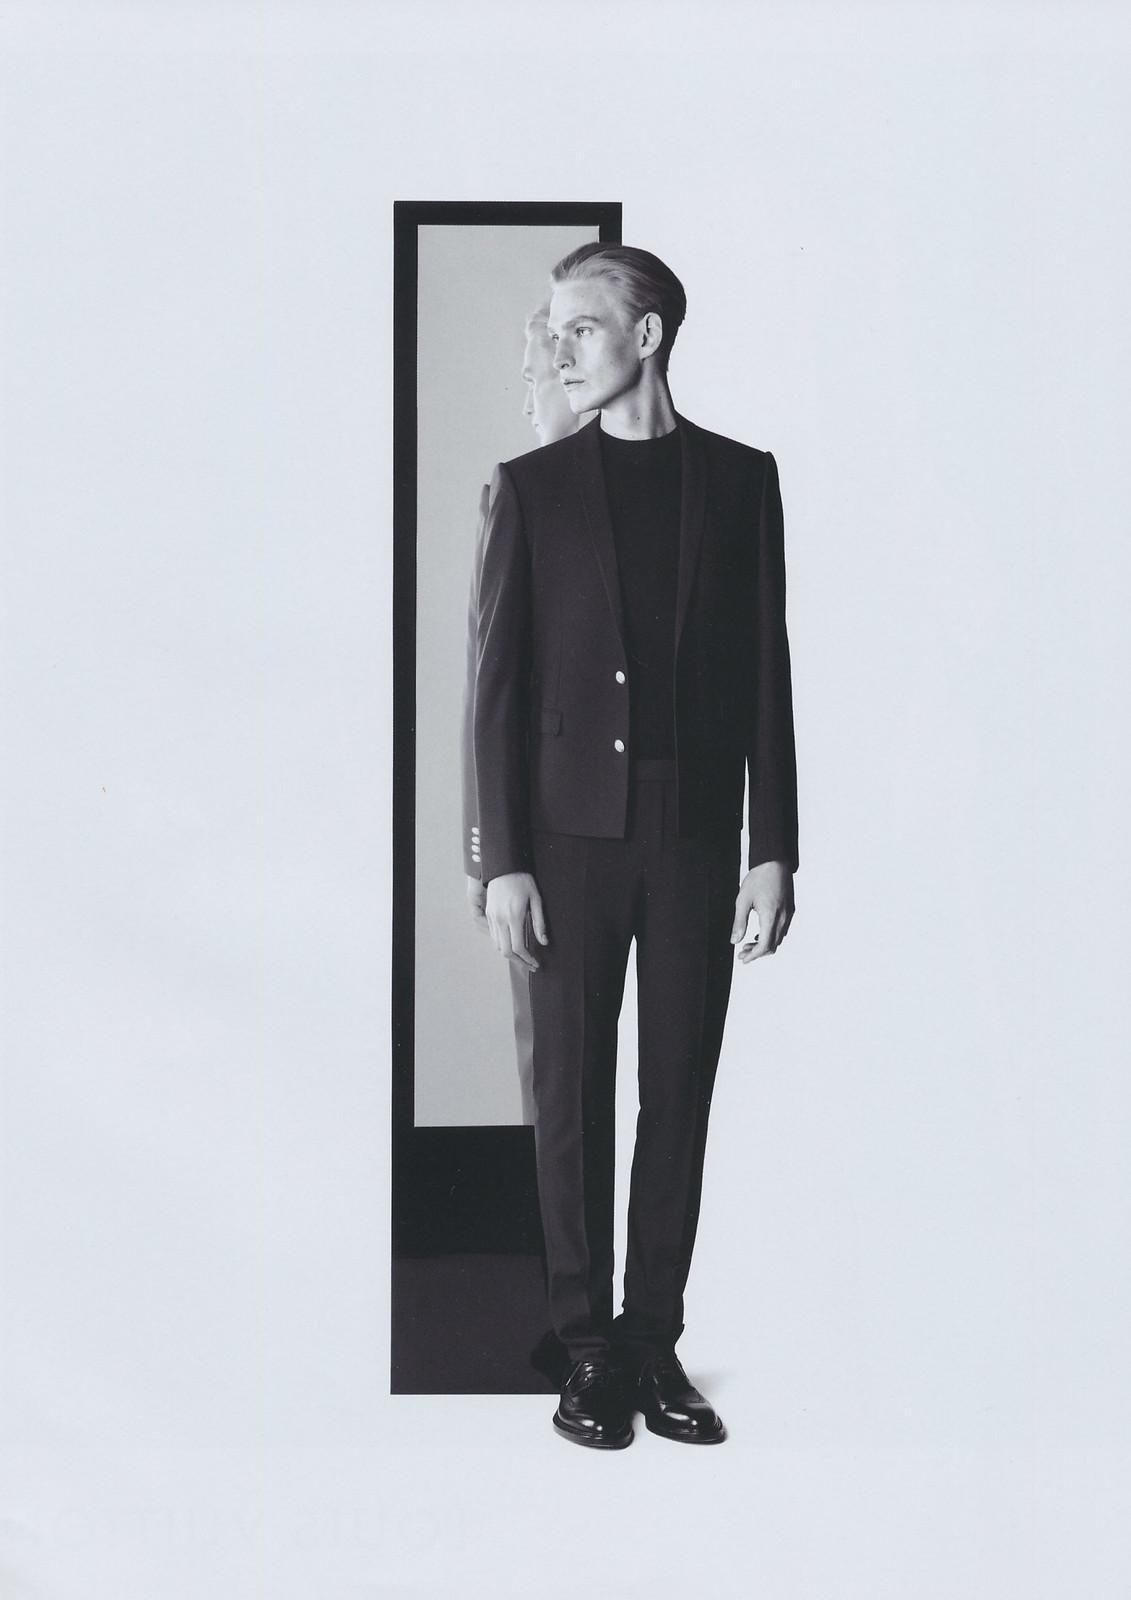 Gerhard Freidl0150_SS13 Dior Homme(MEN'S CLUB627_2013_05)